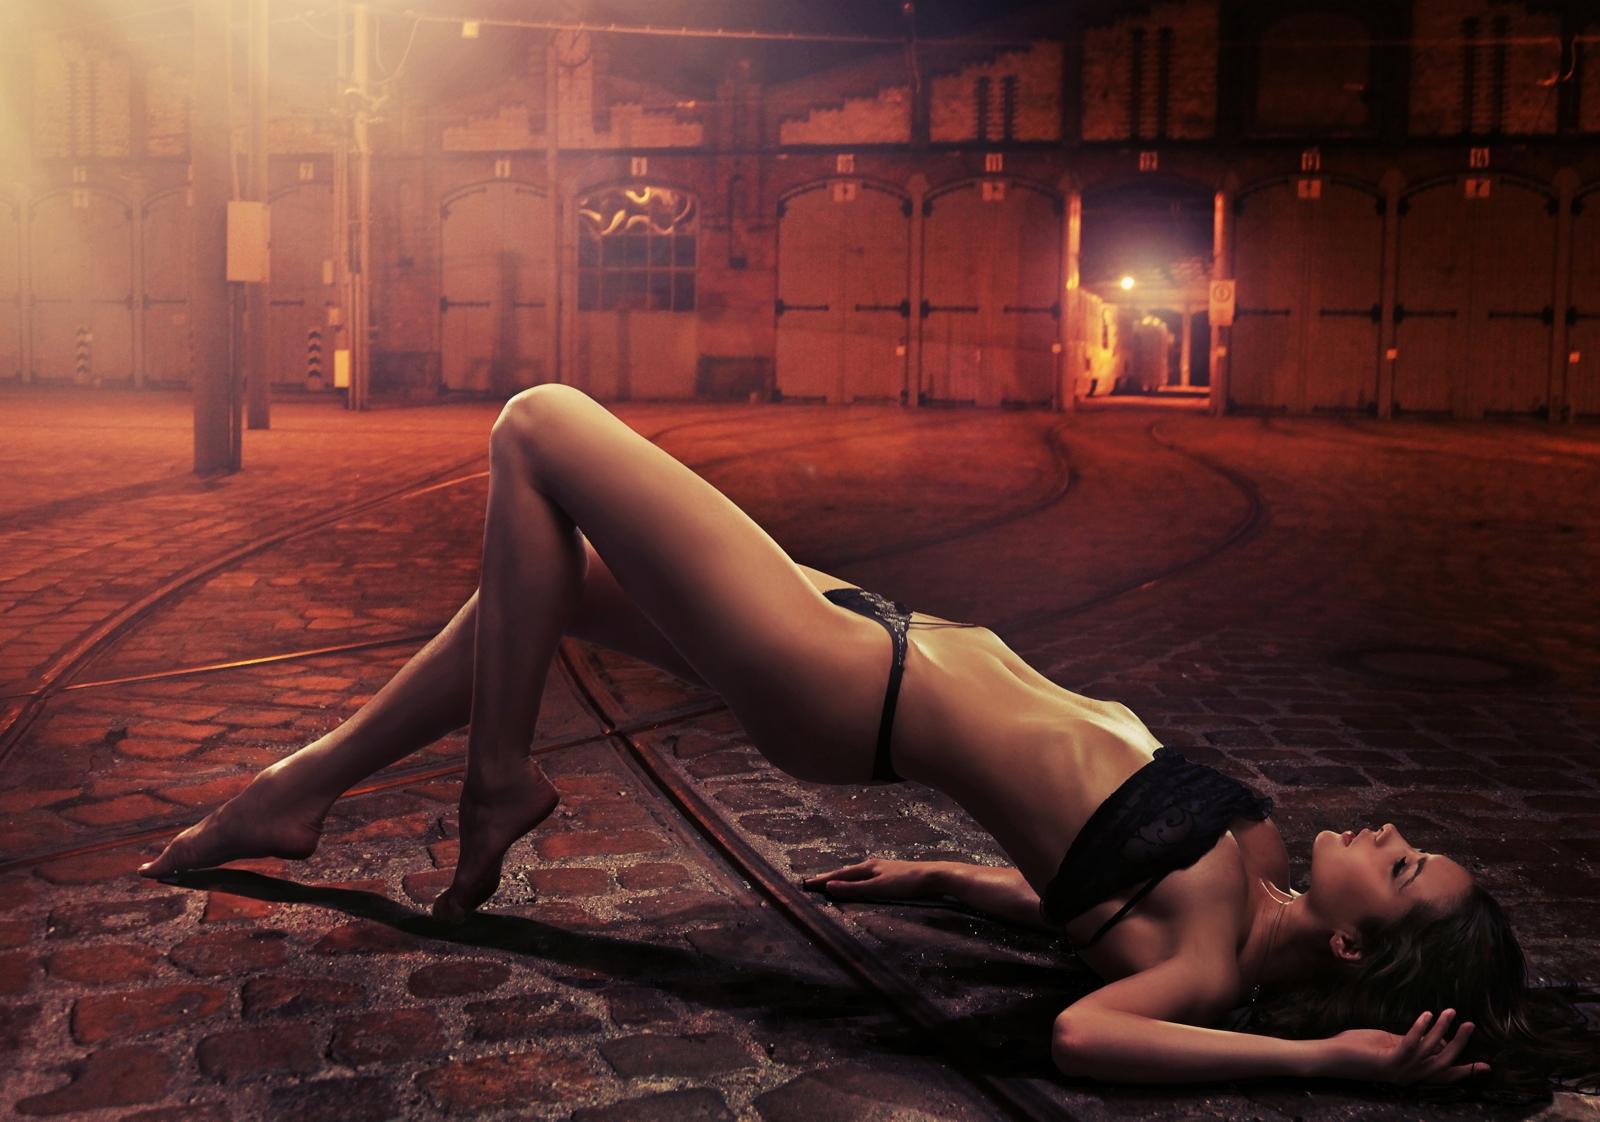 erotic fotografie bdsm geschichten folter